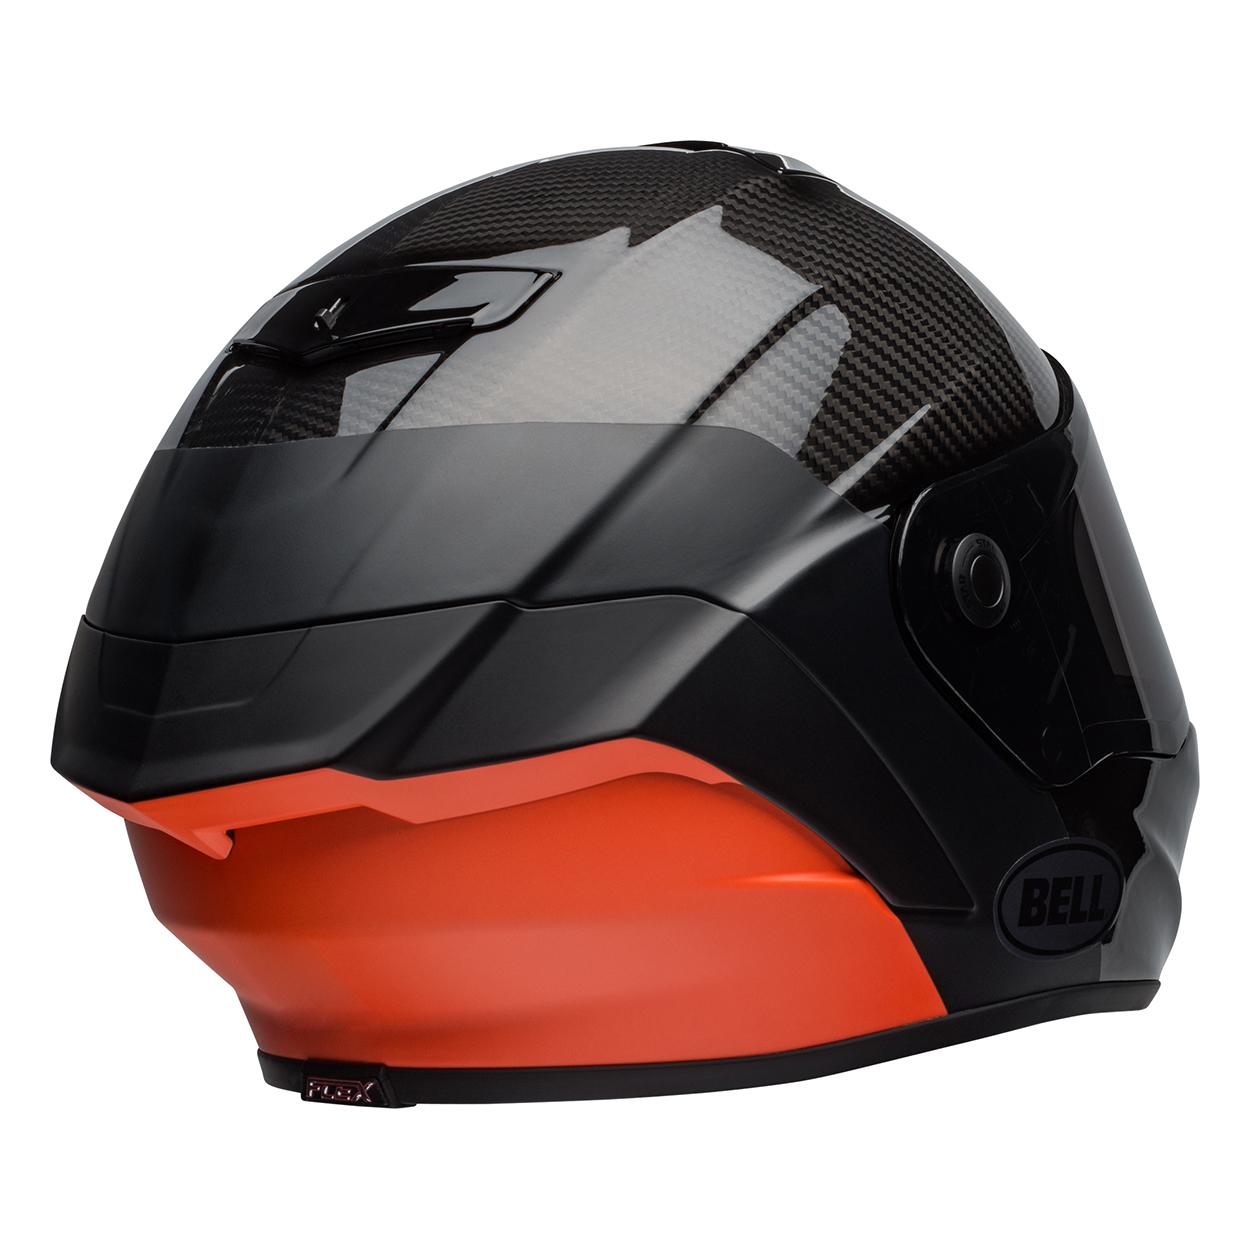 cb3b4d54 Bell Street 2019 Race Star Adult Helmet (Lux Black/Orange ...